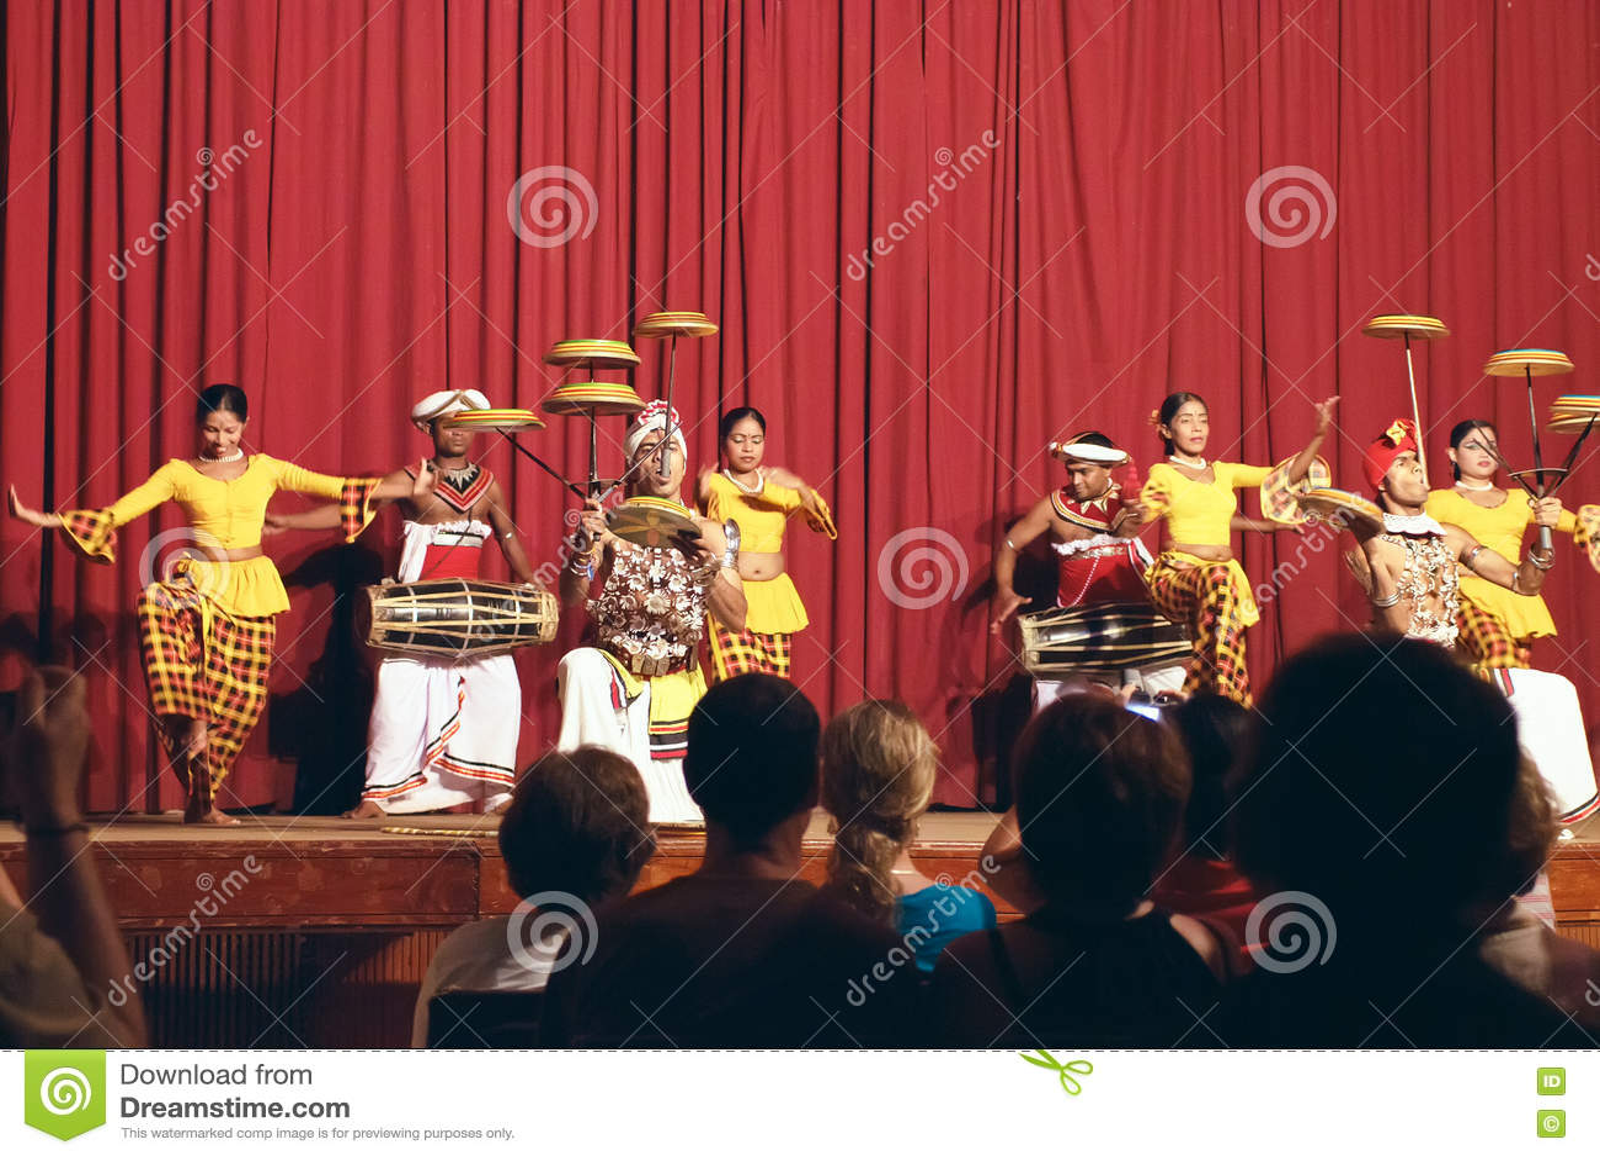 Kandy, Sri Lanka, am 22. Oktober 2011: Kandyan-Tanz-Leistung